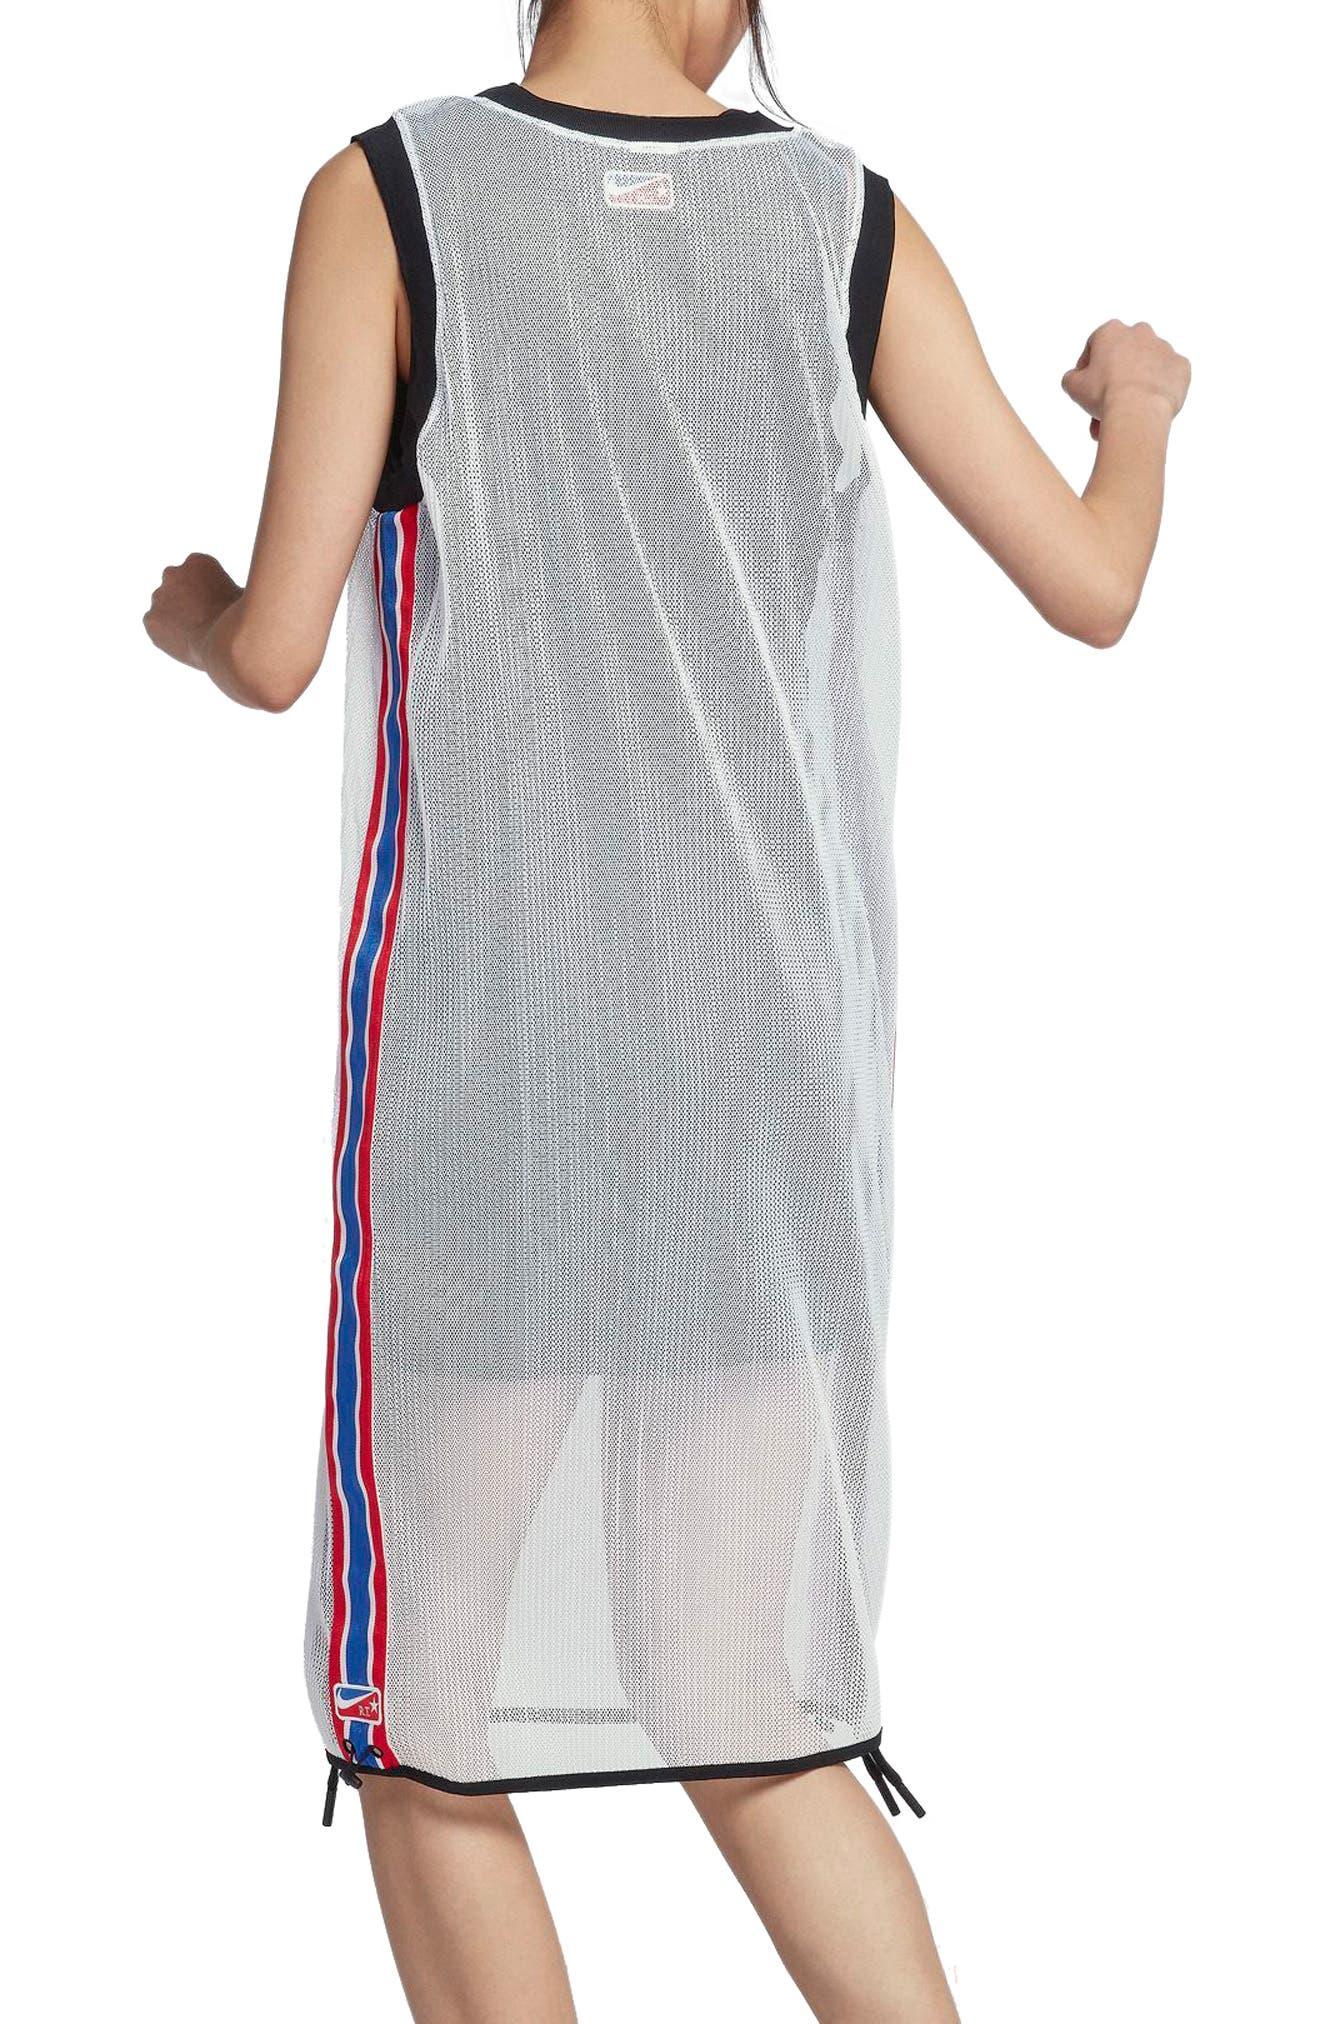 NikeLab x RT Mesh Jersey Dress,                             Alternate thumbnail 2, color,                             100